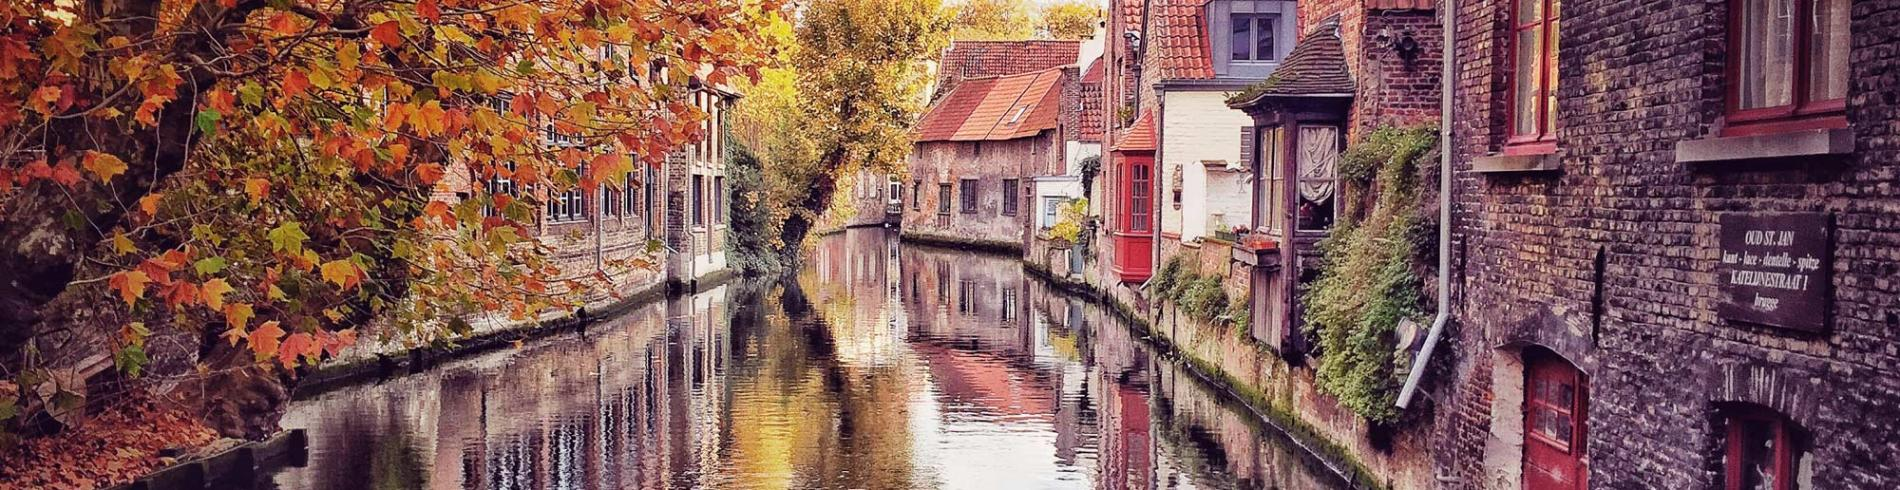 Bruges in the autumn